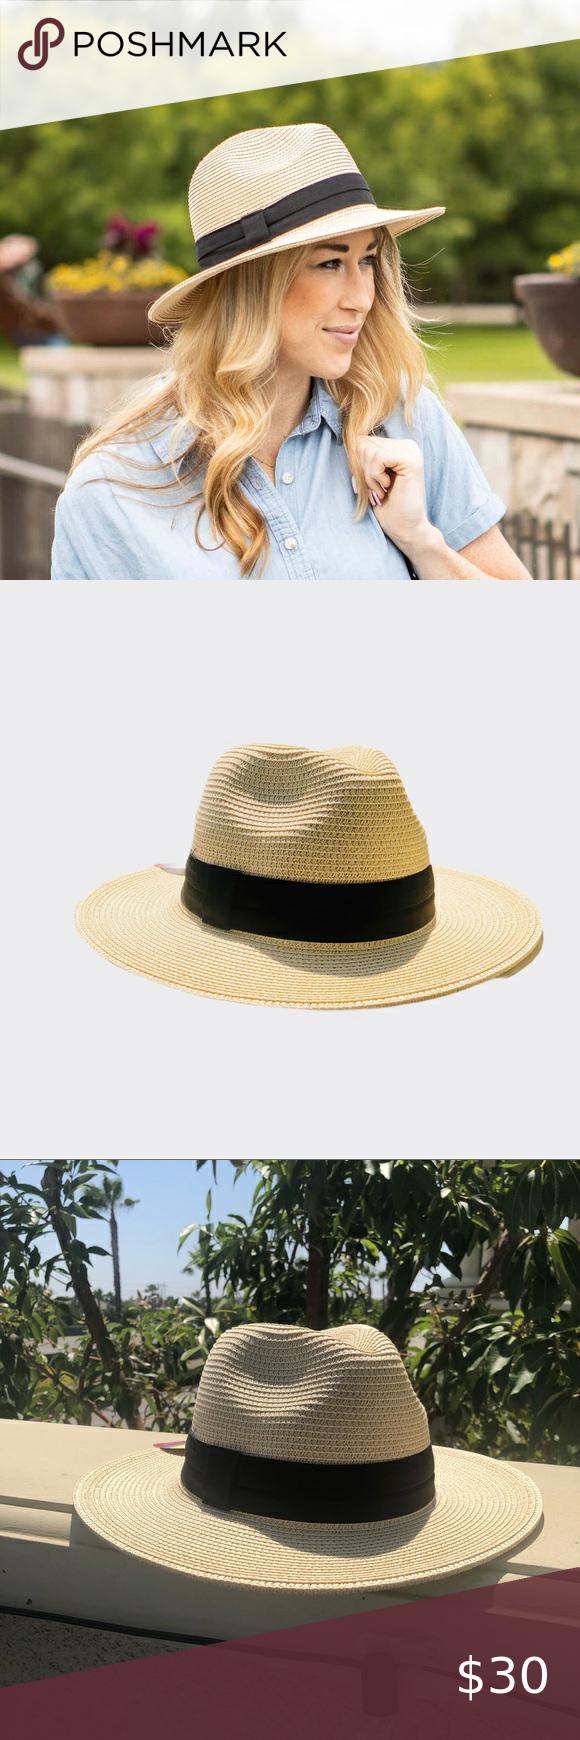 Fedora Sun Hat Weaved Short Brim Beach Spf 50 Nwt Fedora Weaved Sun Hat Short Brim Beach Spf 50 Nwt Solar Escape Fedora Hat Unis Sun Hats Women Shopping Fedora